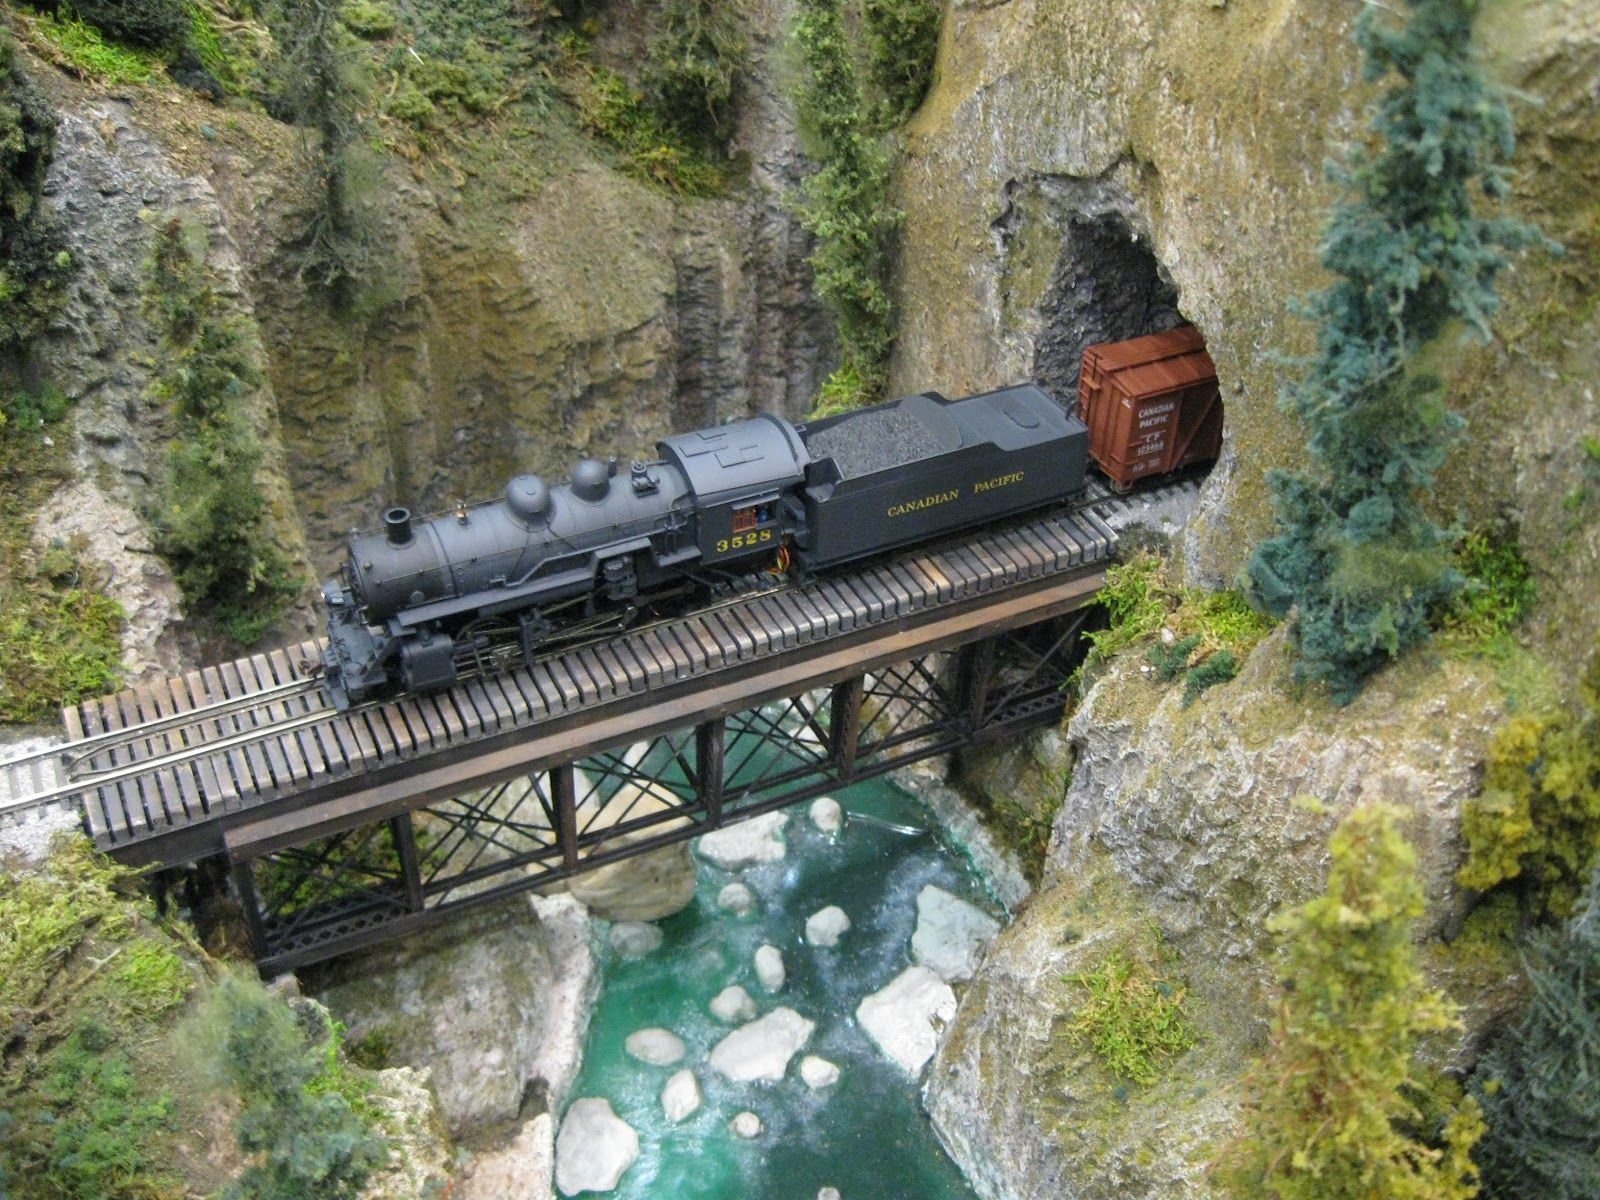 model railway layouts - Google Search #modeltrainhowto